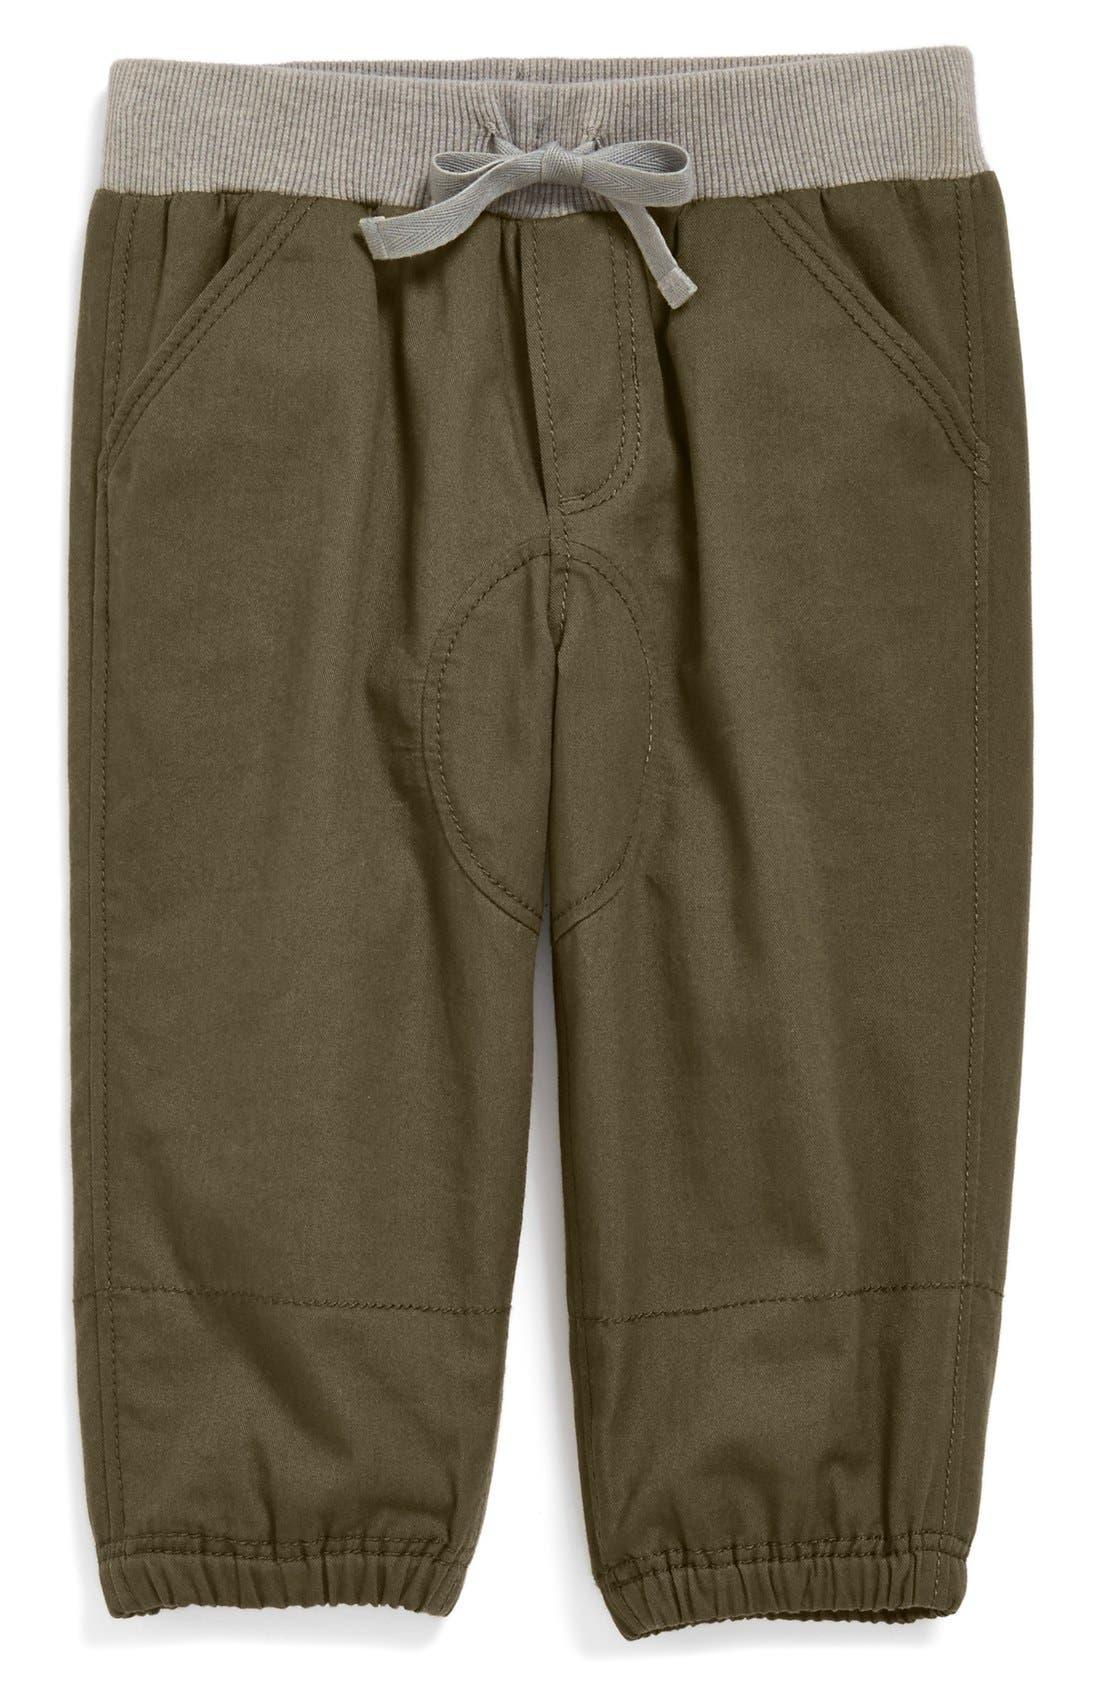 Alternate Image 1 Selected - Tucker + Tate Knit Waist Pants (Baby Boys)